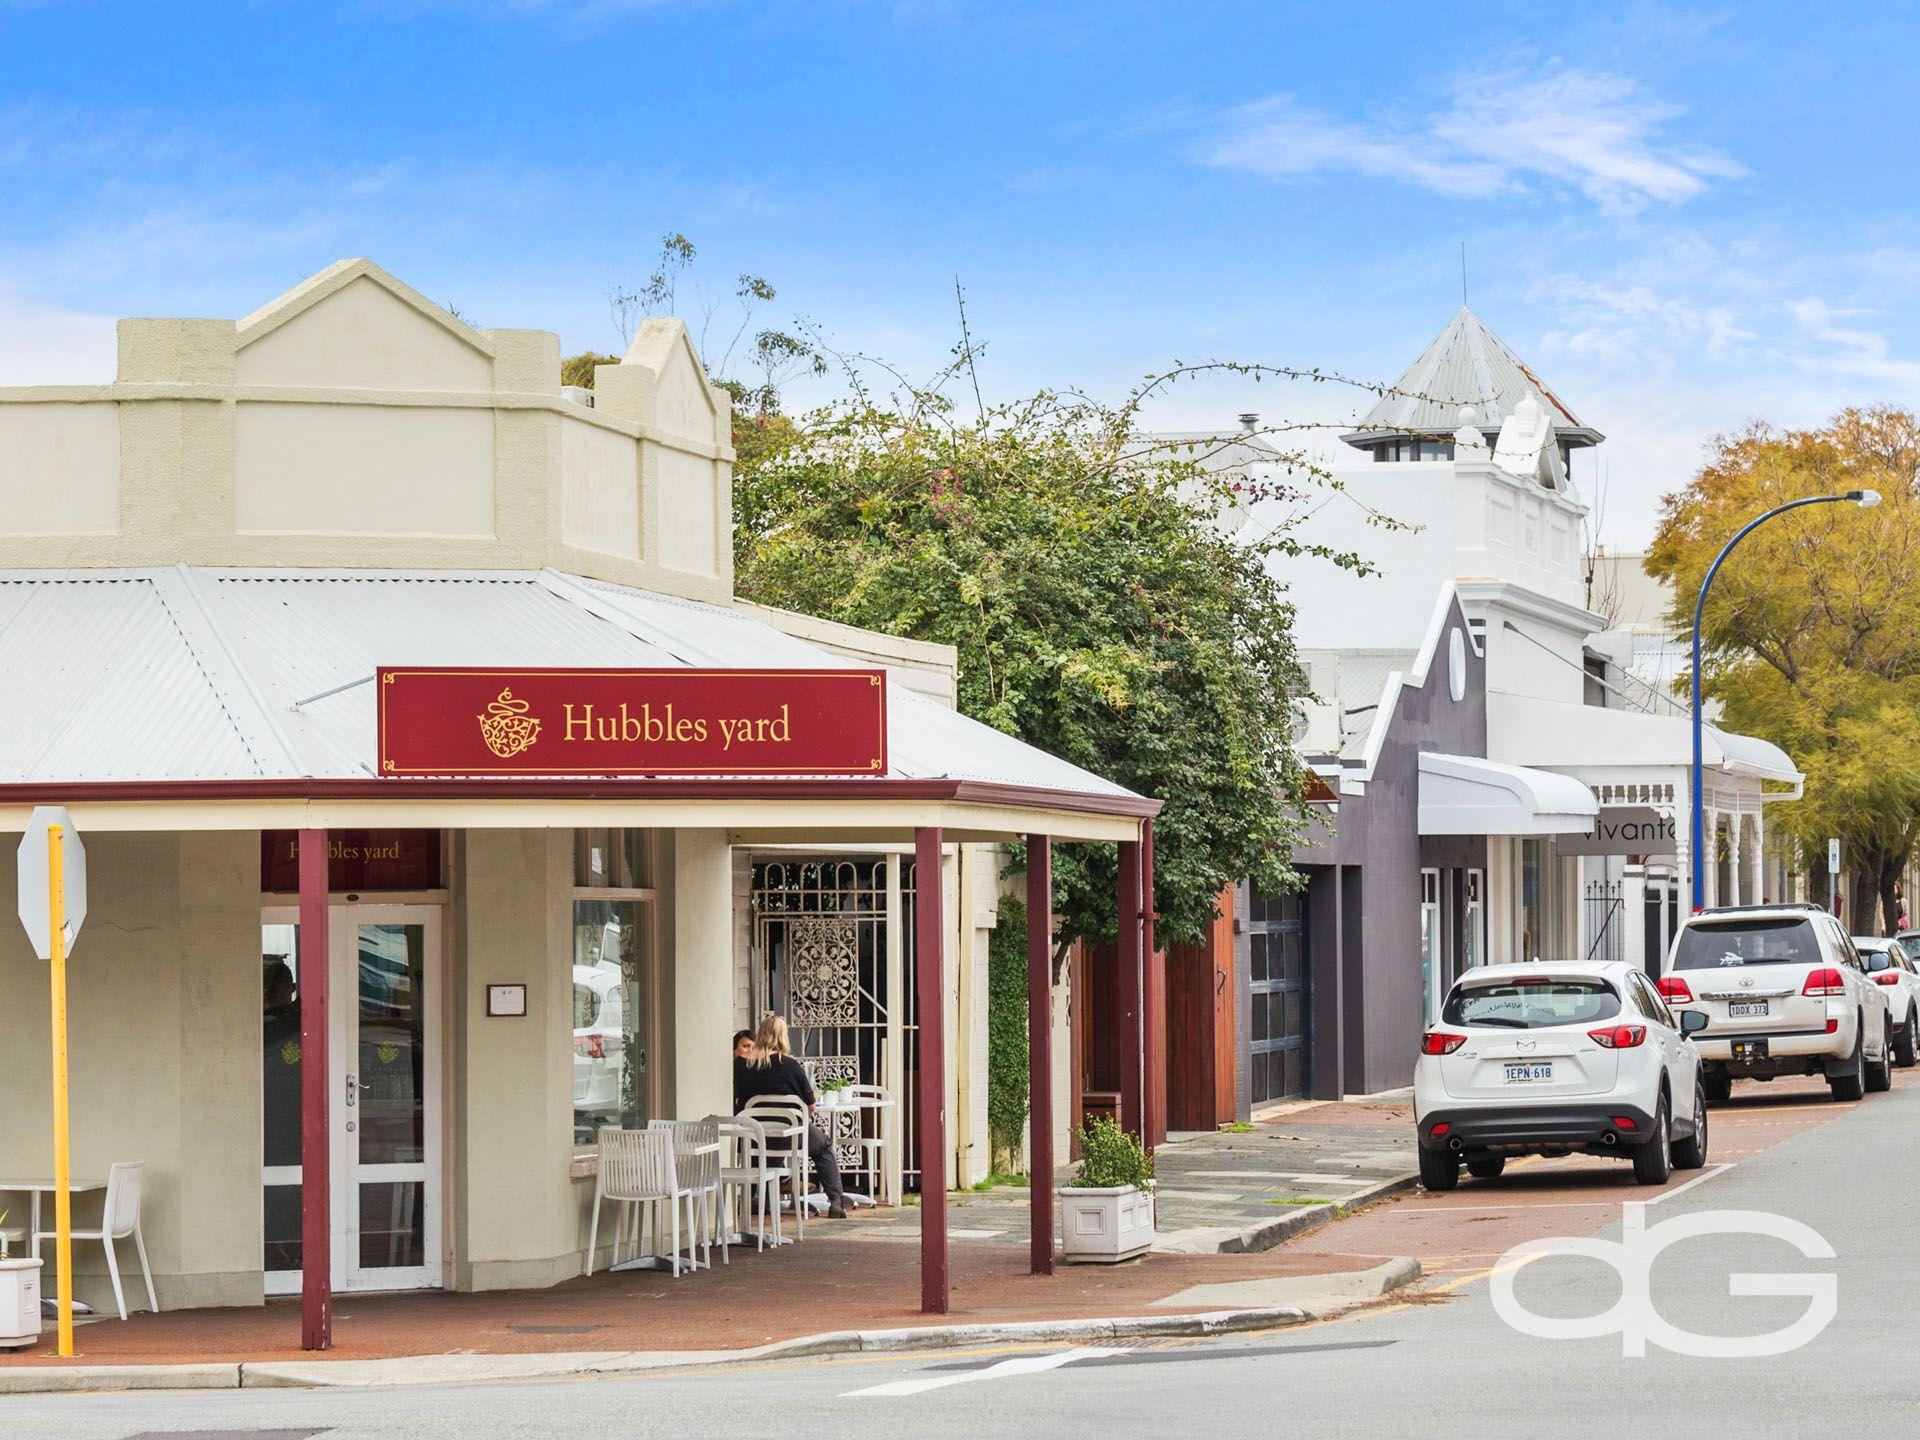 3/84 Hubble Street, East Fremantle